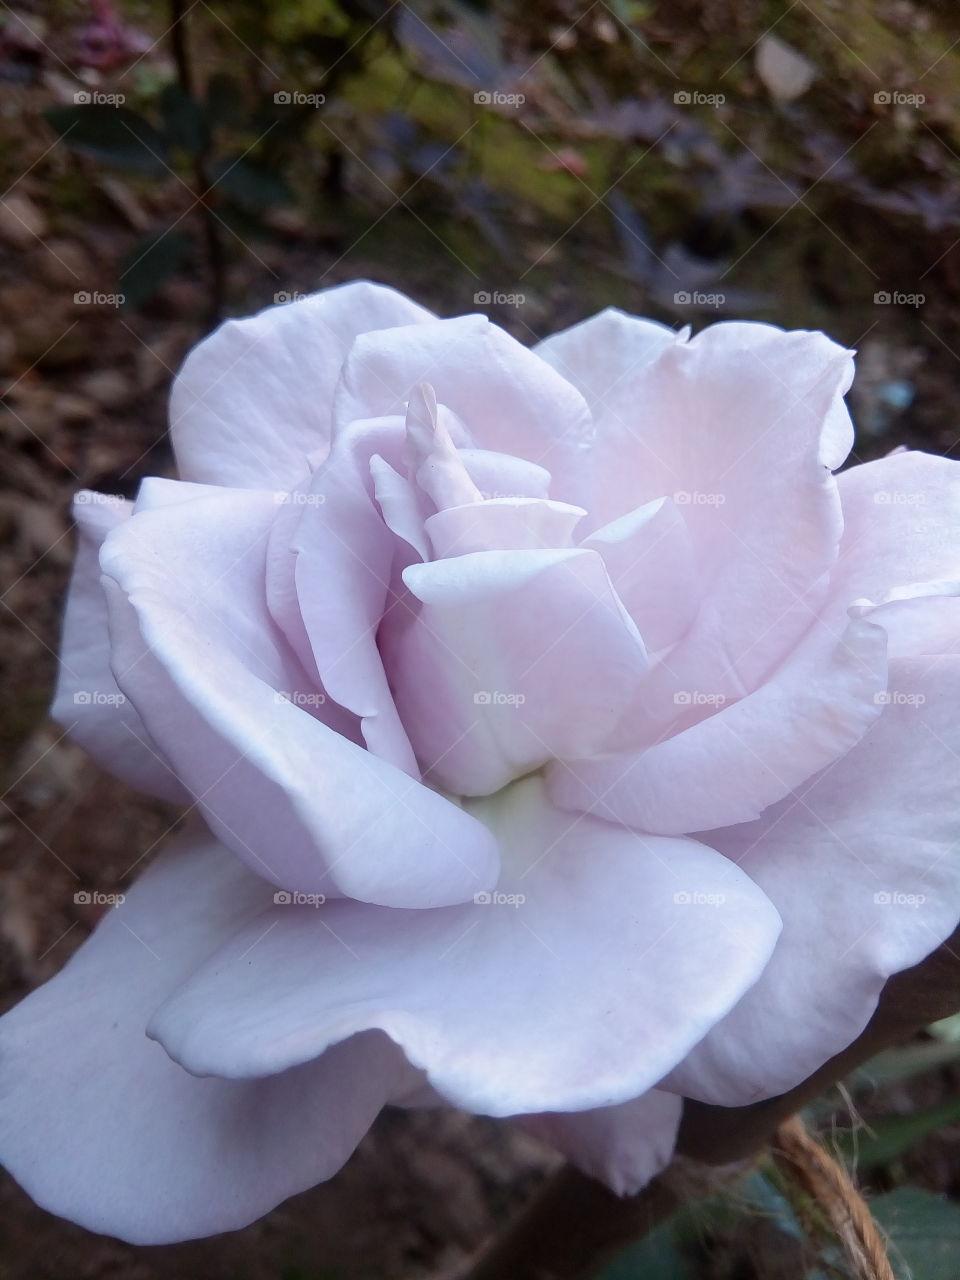 flower 2018-01-22 062  #আমার_চোখে #আমার_গ্রাম #nature #flower  #eukaryota #plantae #angiosperms #eudicots